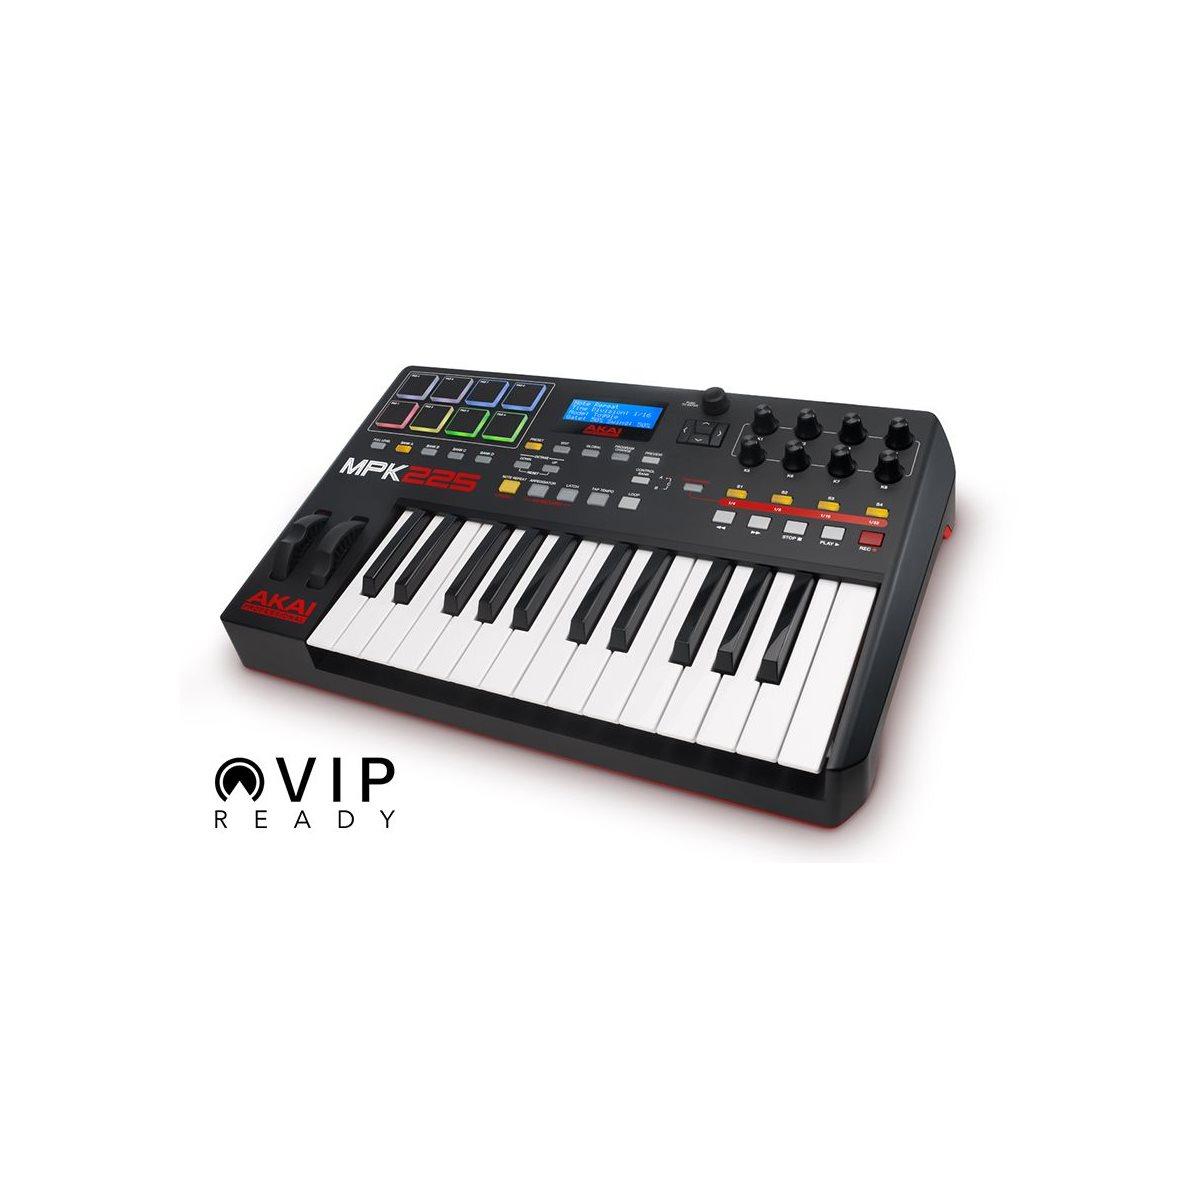 AKAI - MPK225 - Compact Keyboard Controller - 25 touches